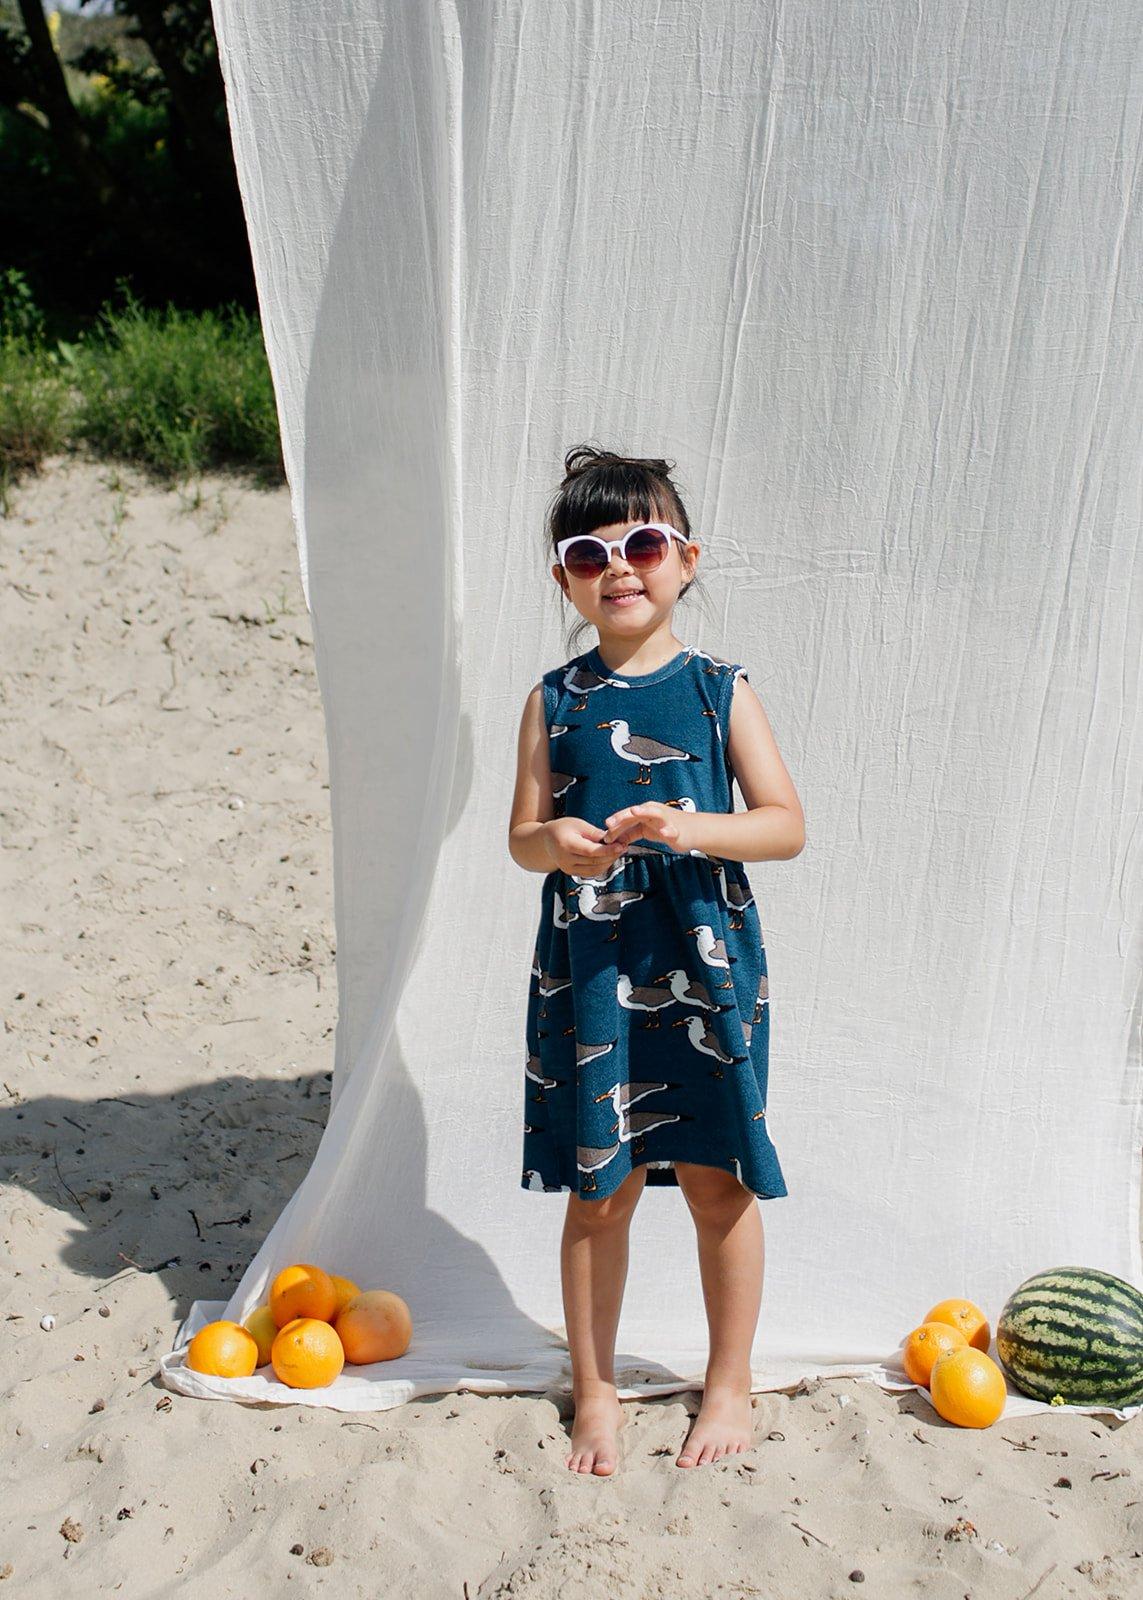 Sandy Seagull Terrycloth Dress by Carlijnq